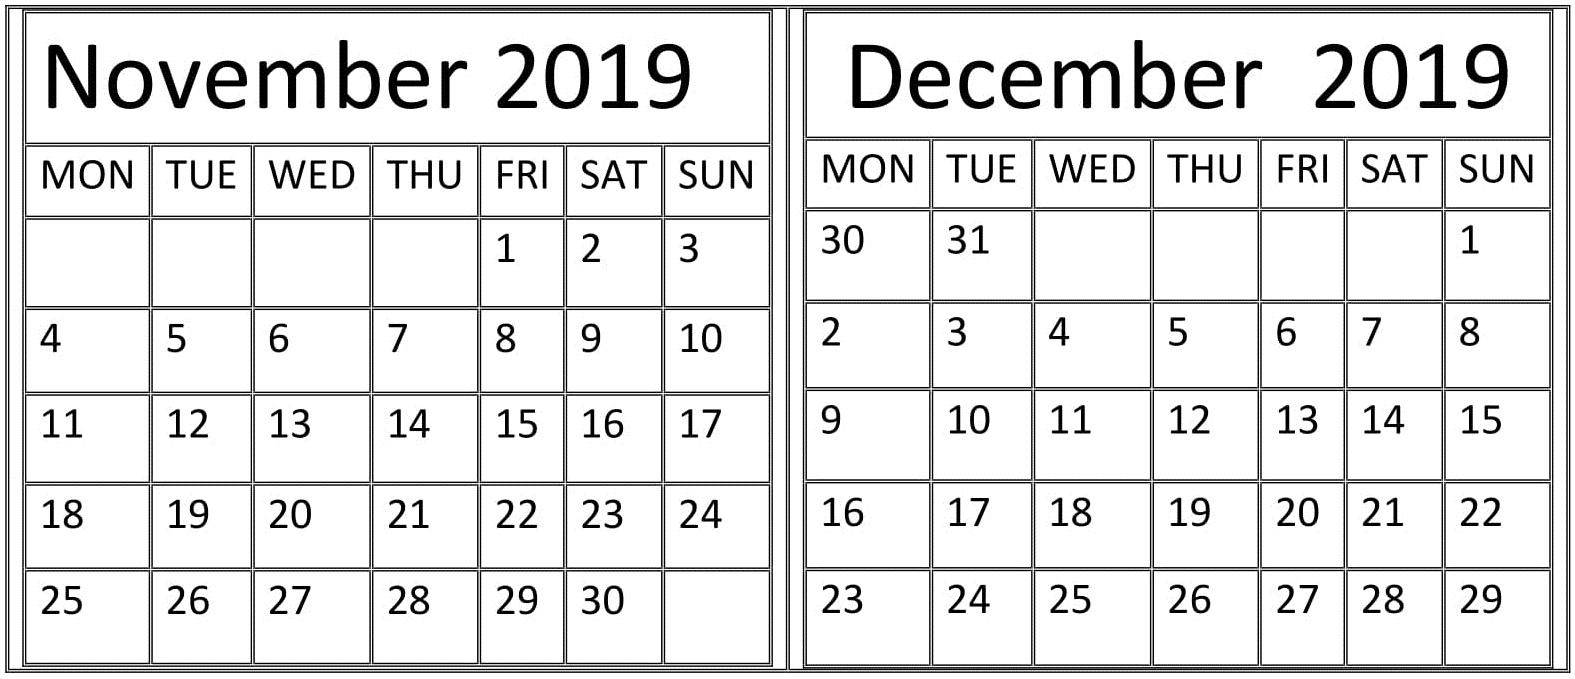 November December 2019 Calendar Printable Planner - Latest